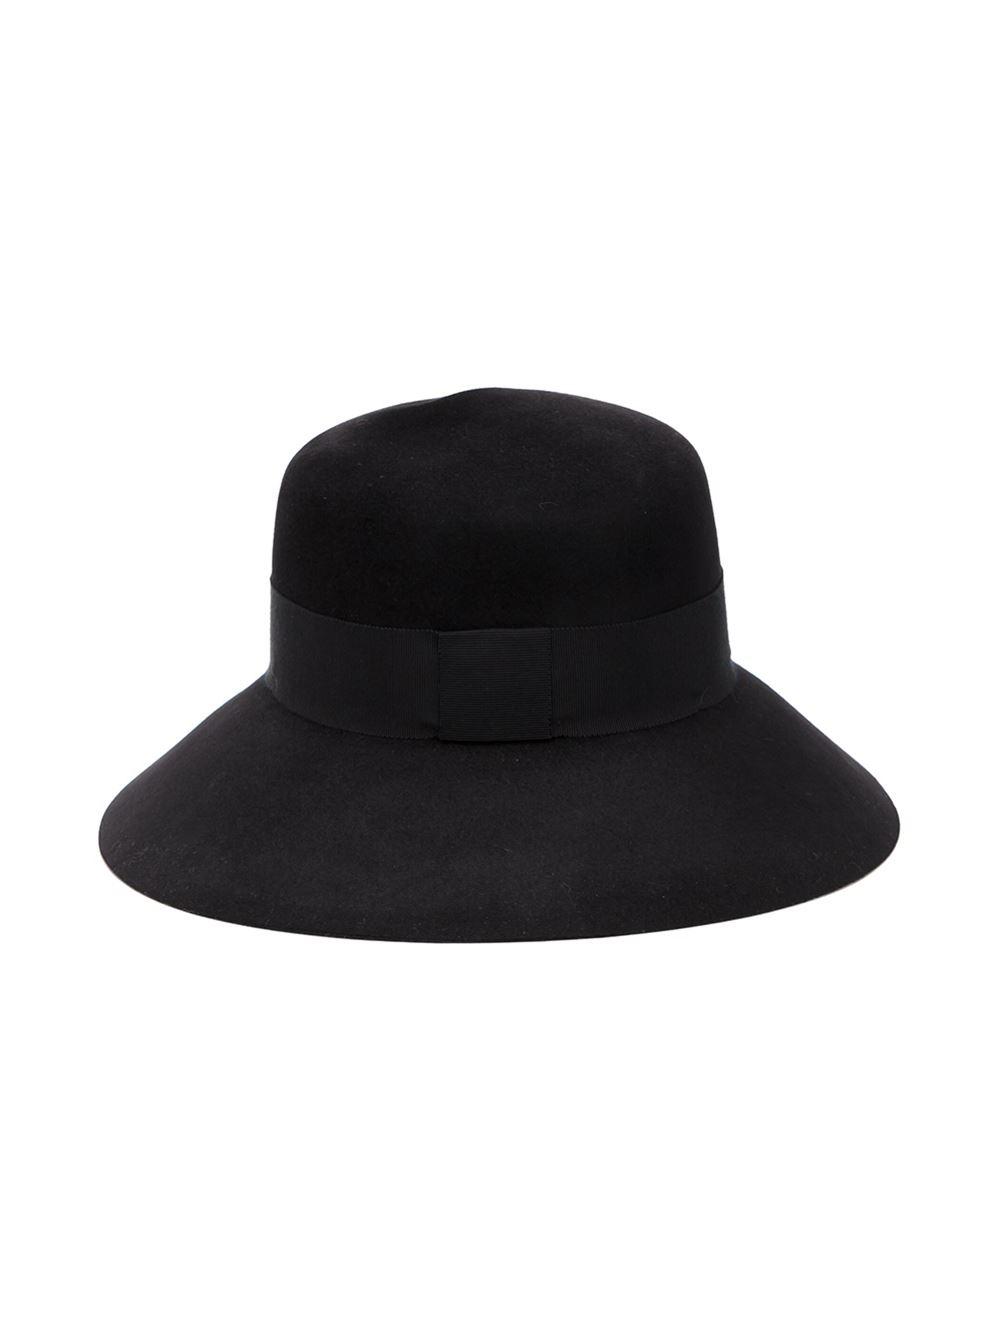 Maison michel felt hat in black lyst for Maison michel